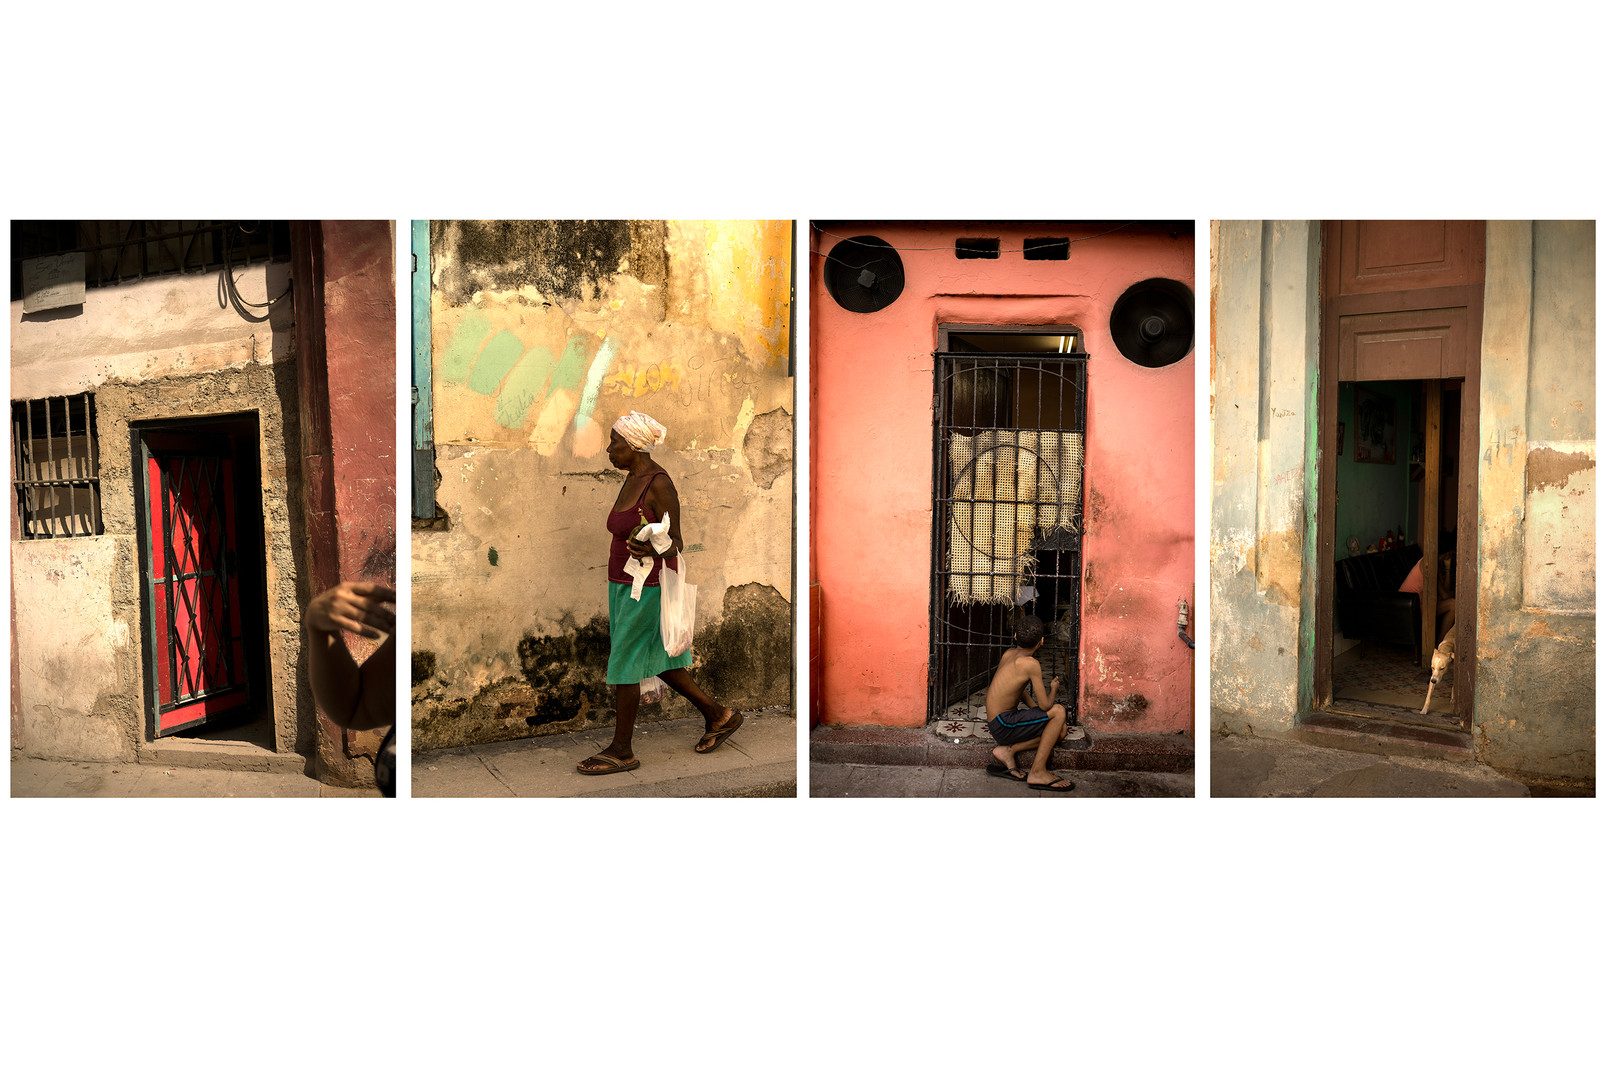 Doors and walls